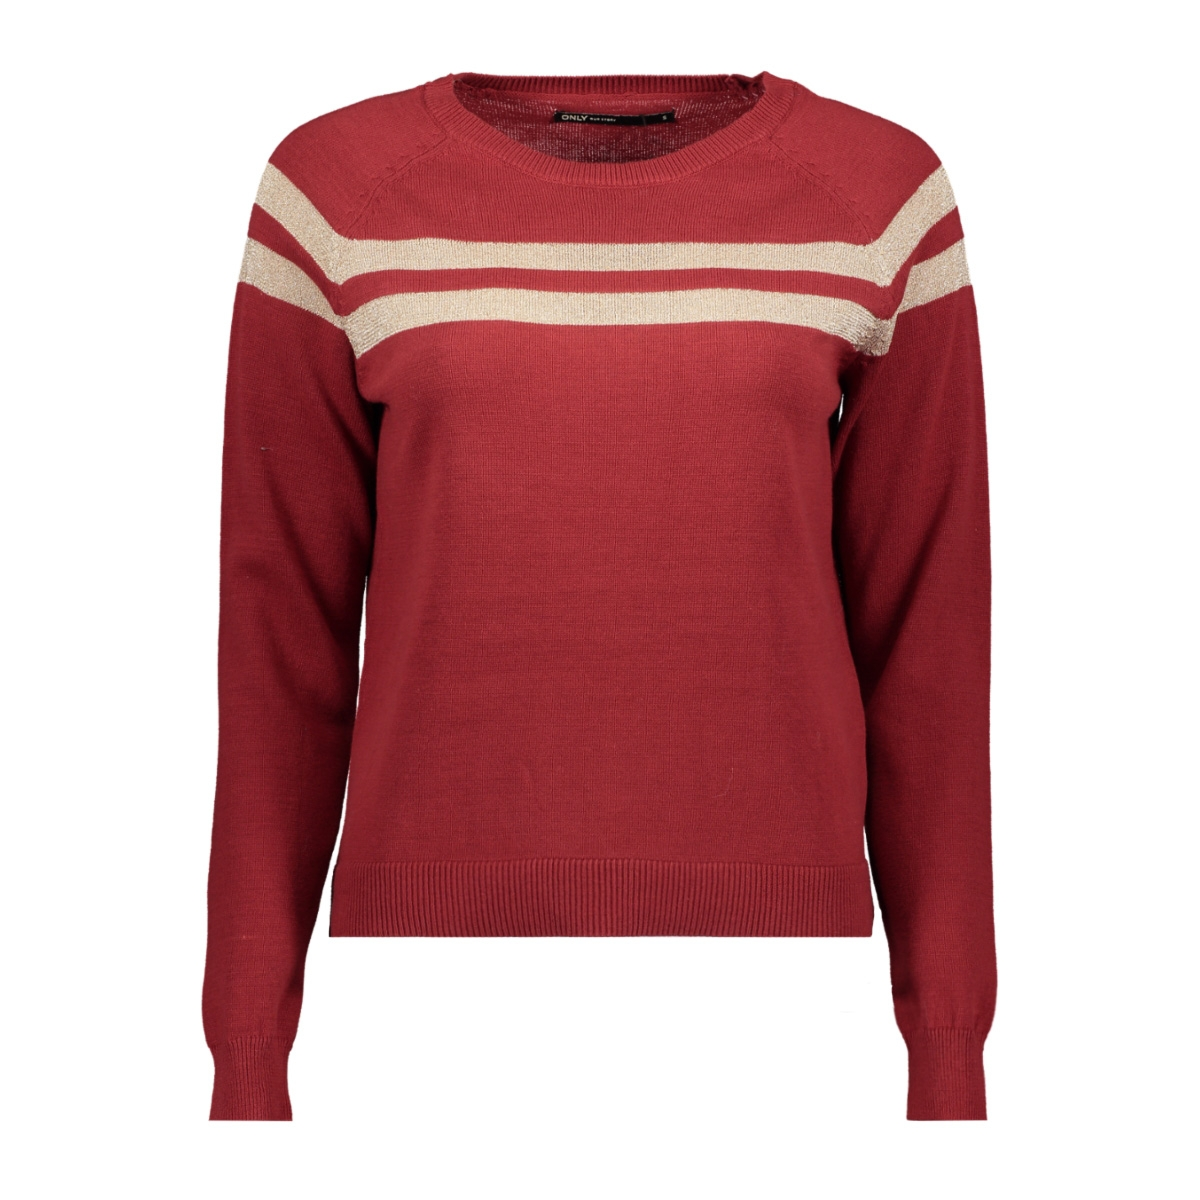 onlamelie l/s pullover knt 15184469 only trui merlot/rose gold